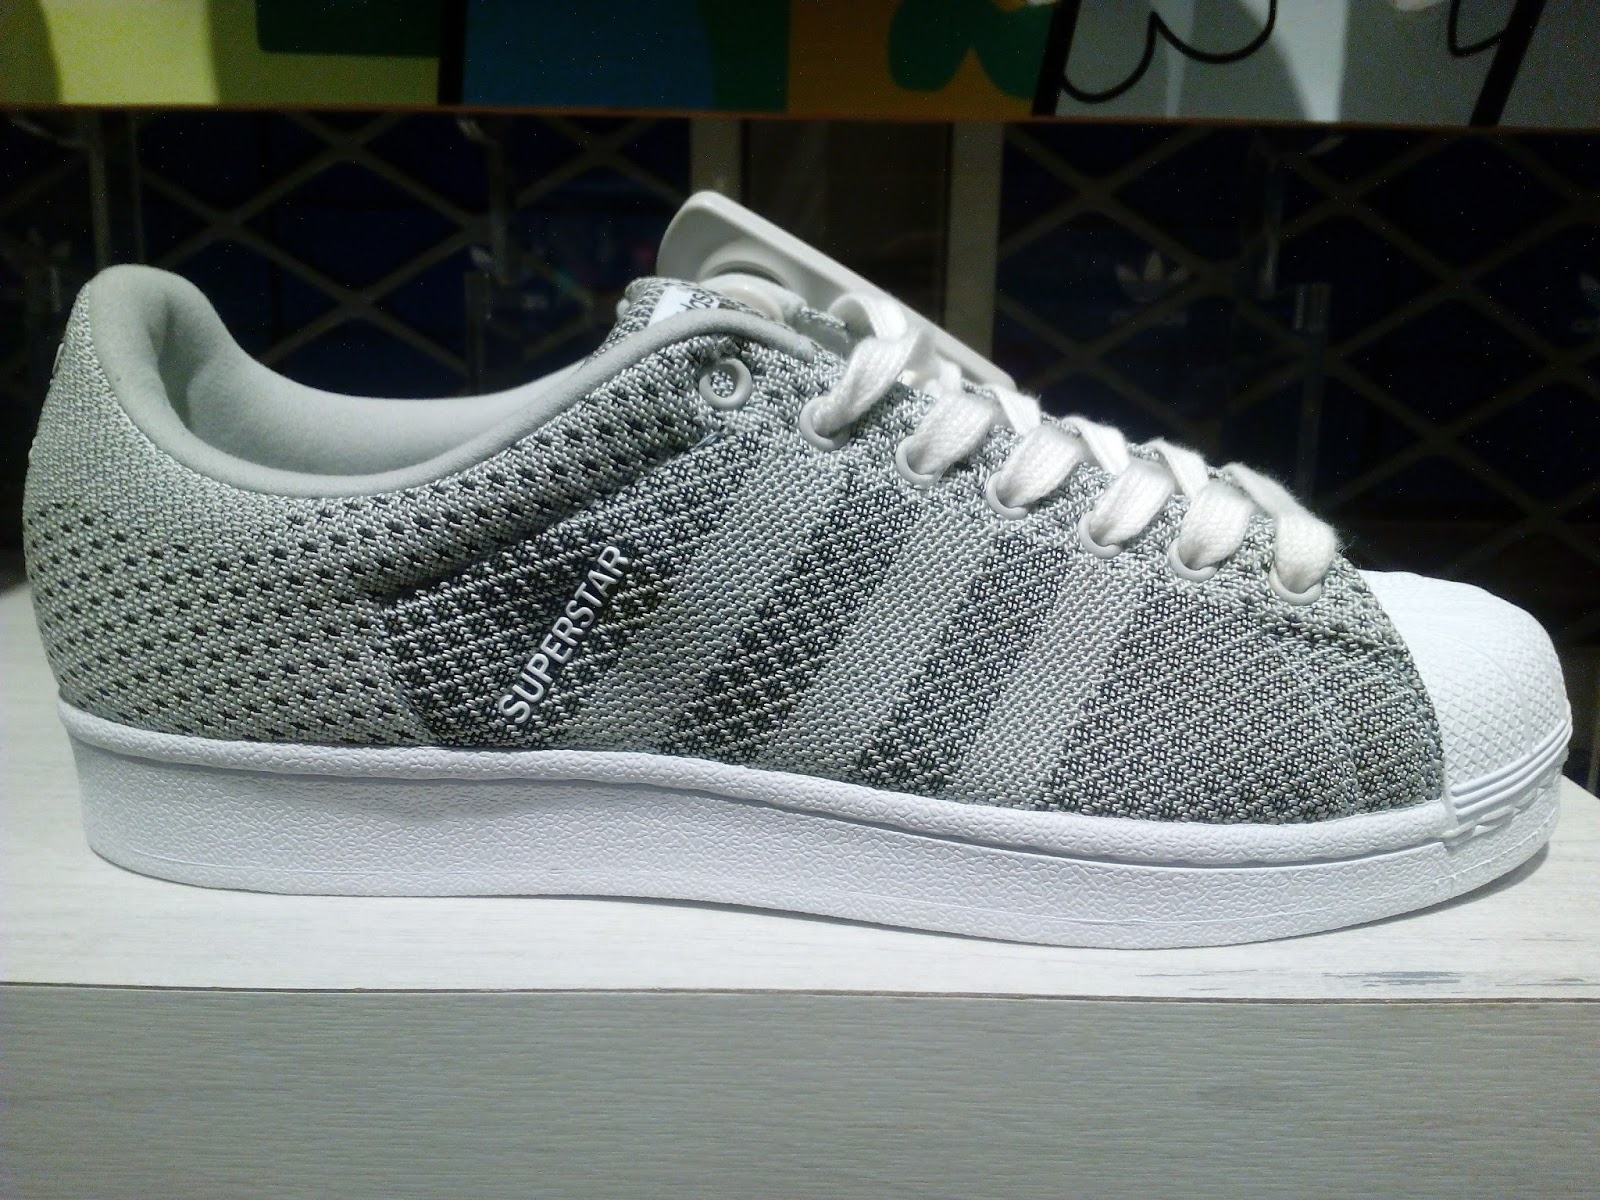 Adidas Superstar Weave Pack